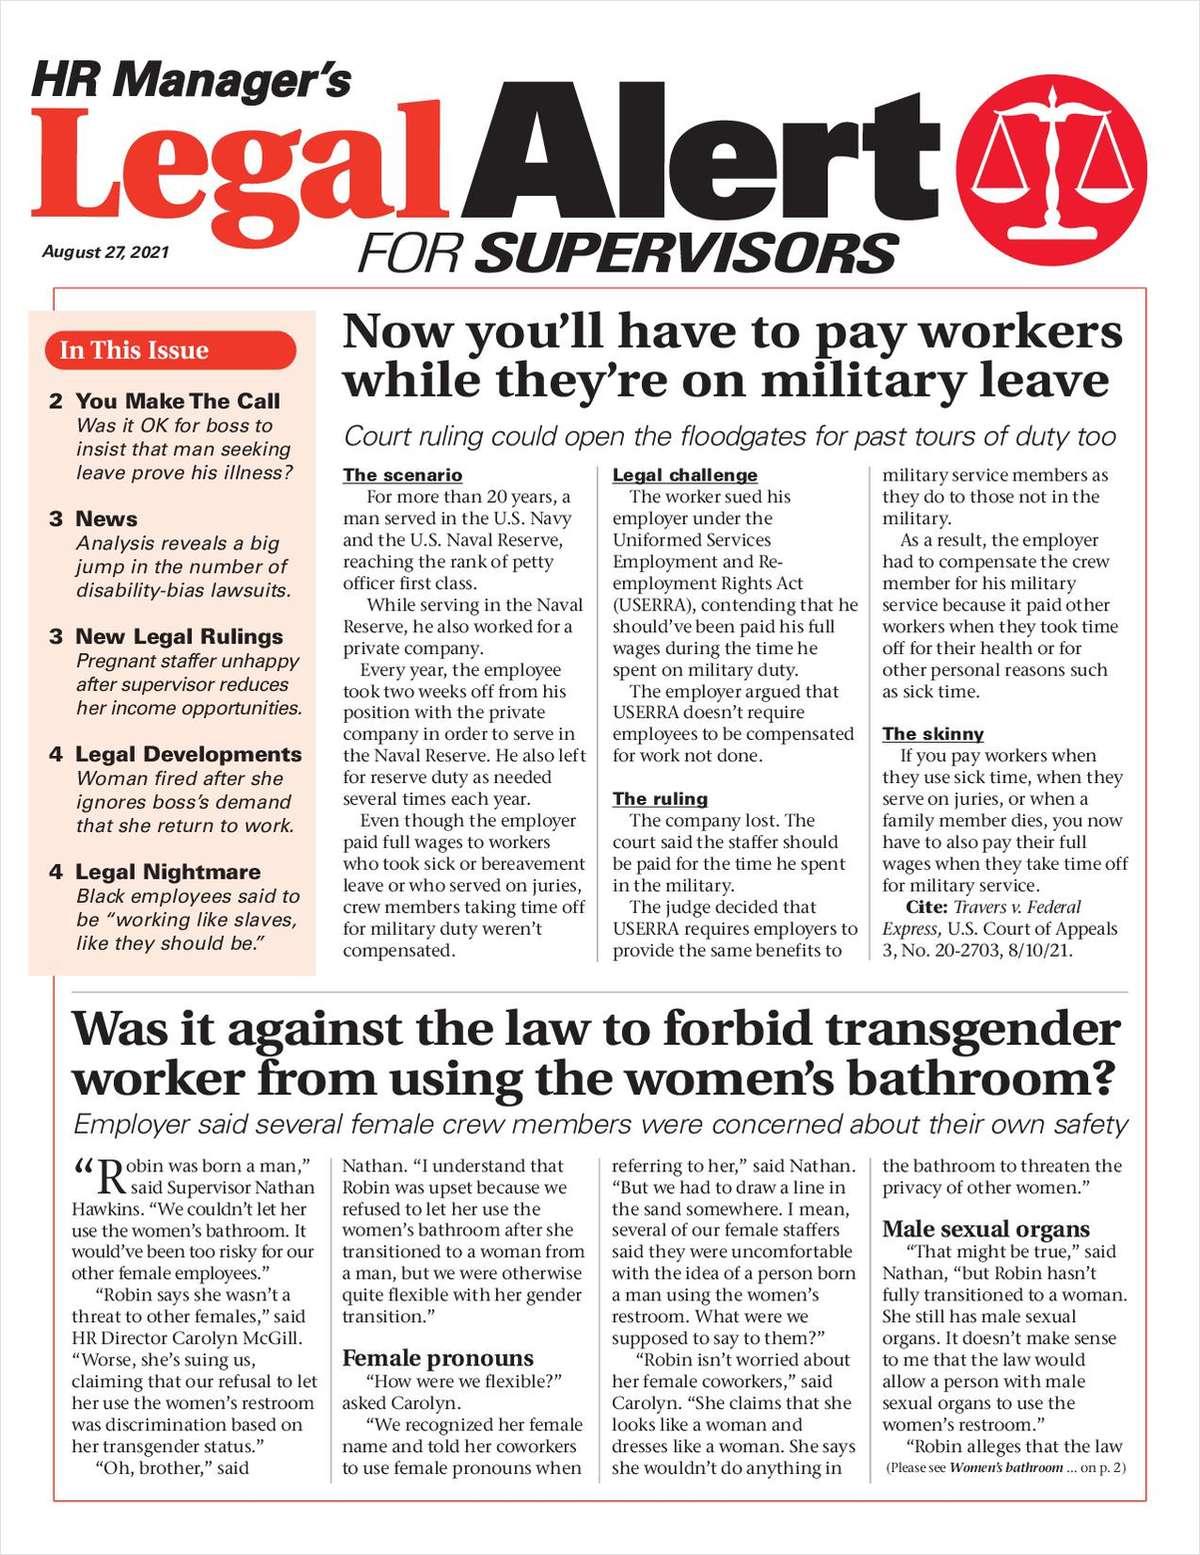 HR Manager's Legal Alert for Supervisors Newsletter: August 27 Edition